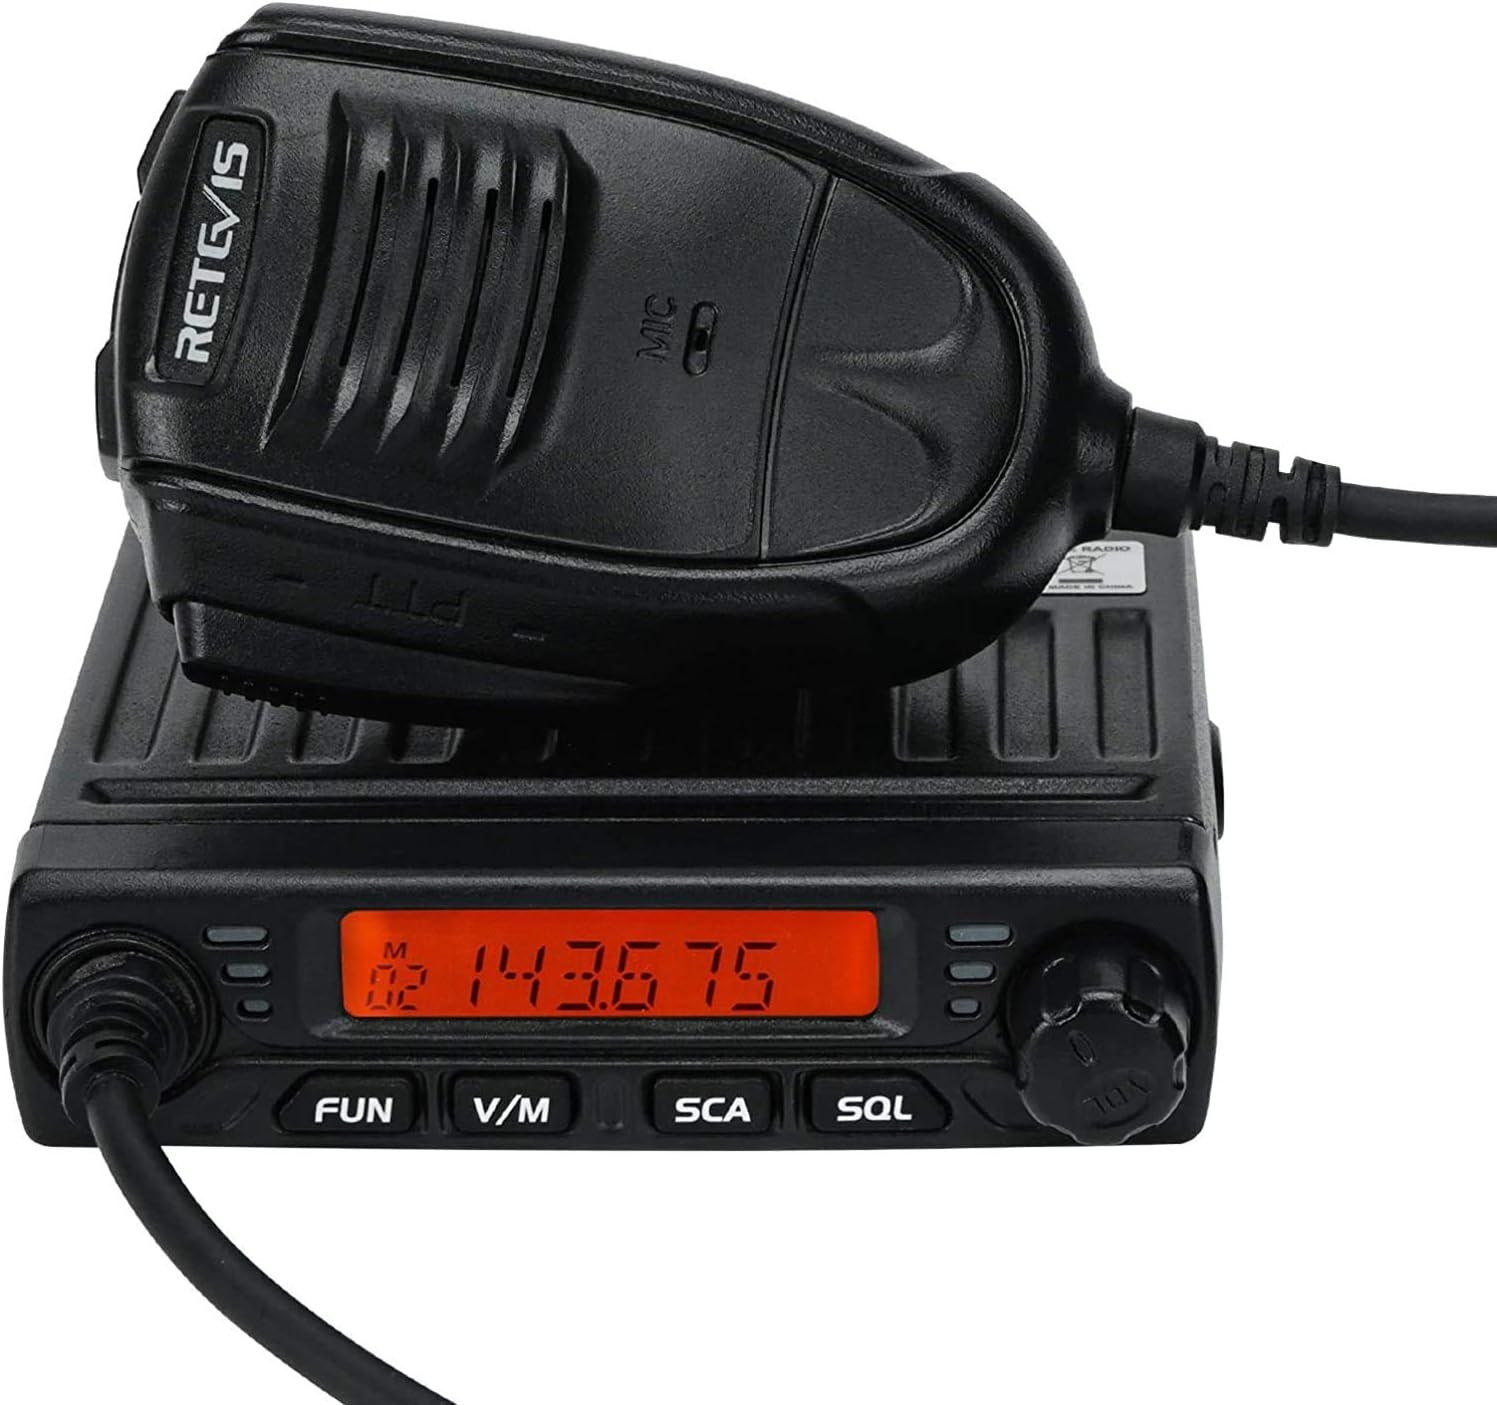 Retevis Rt98 Mobile Transceiver 15w 10w Elektronik